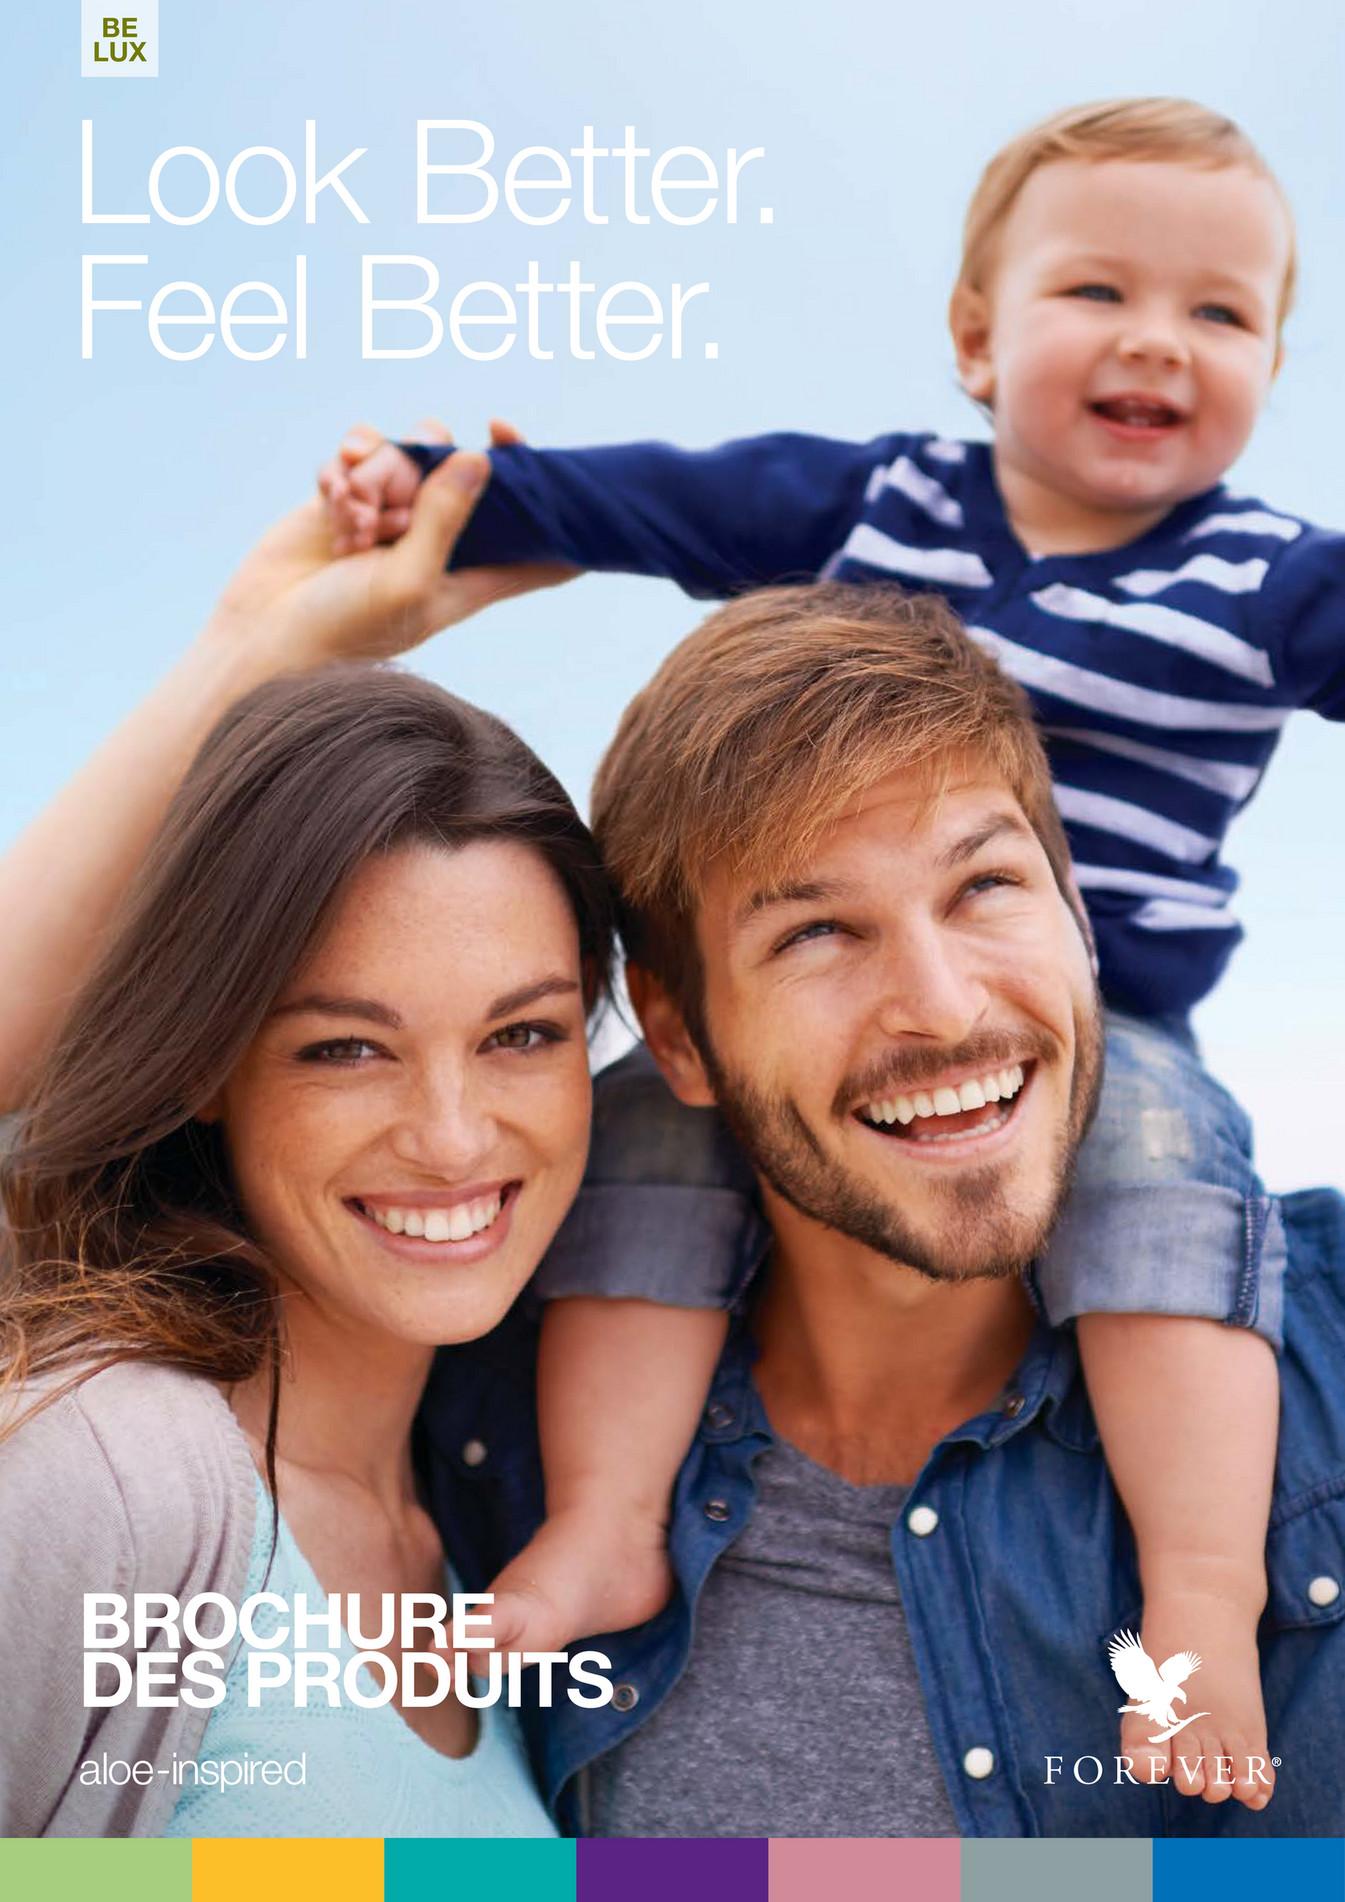 Forever Living Products Benelux Brochure Des Produits